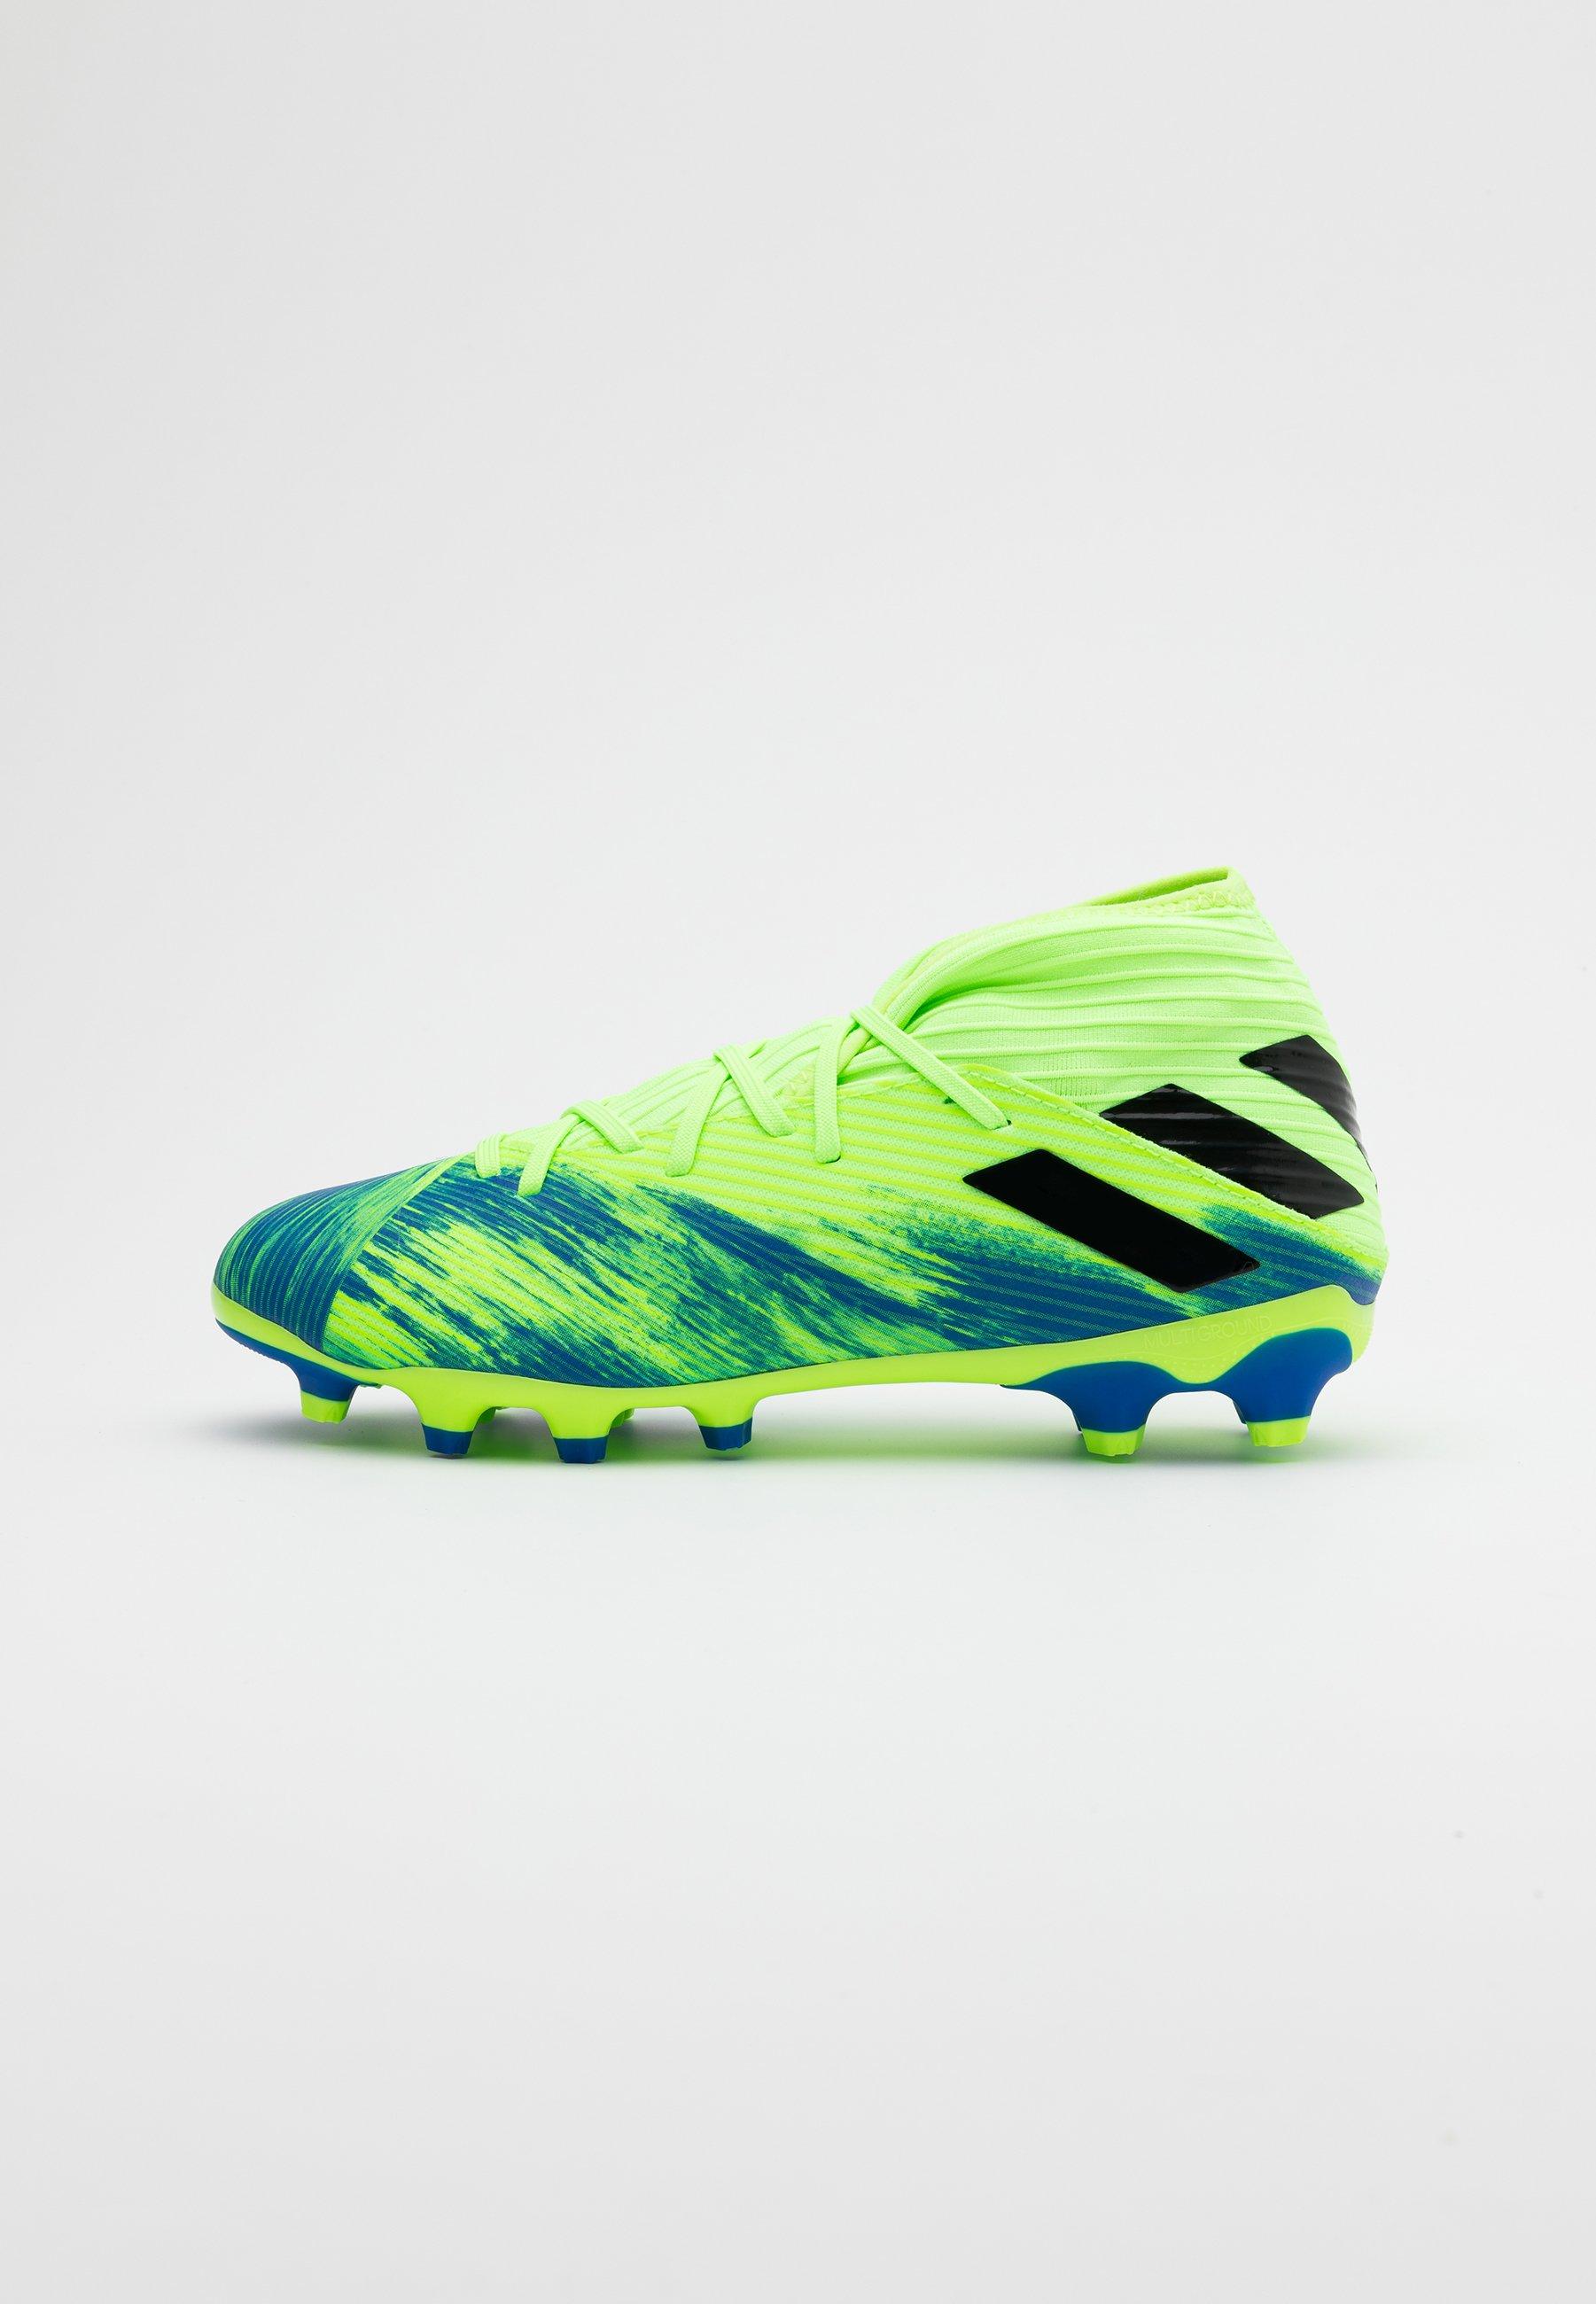 ADIDAS PERFORMANCE Fußballschuh 'NEMEZIZ 19.3 MG' in gold